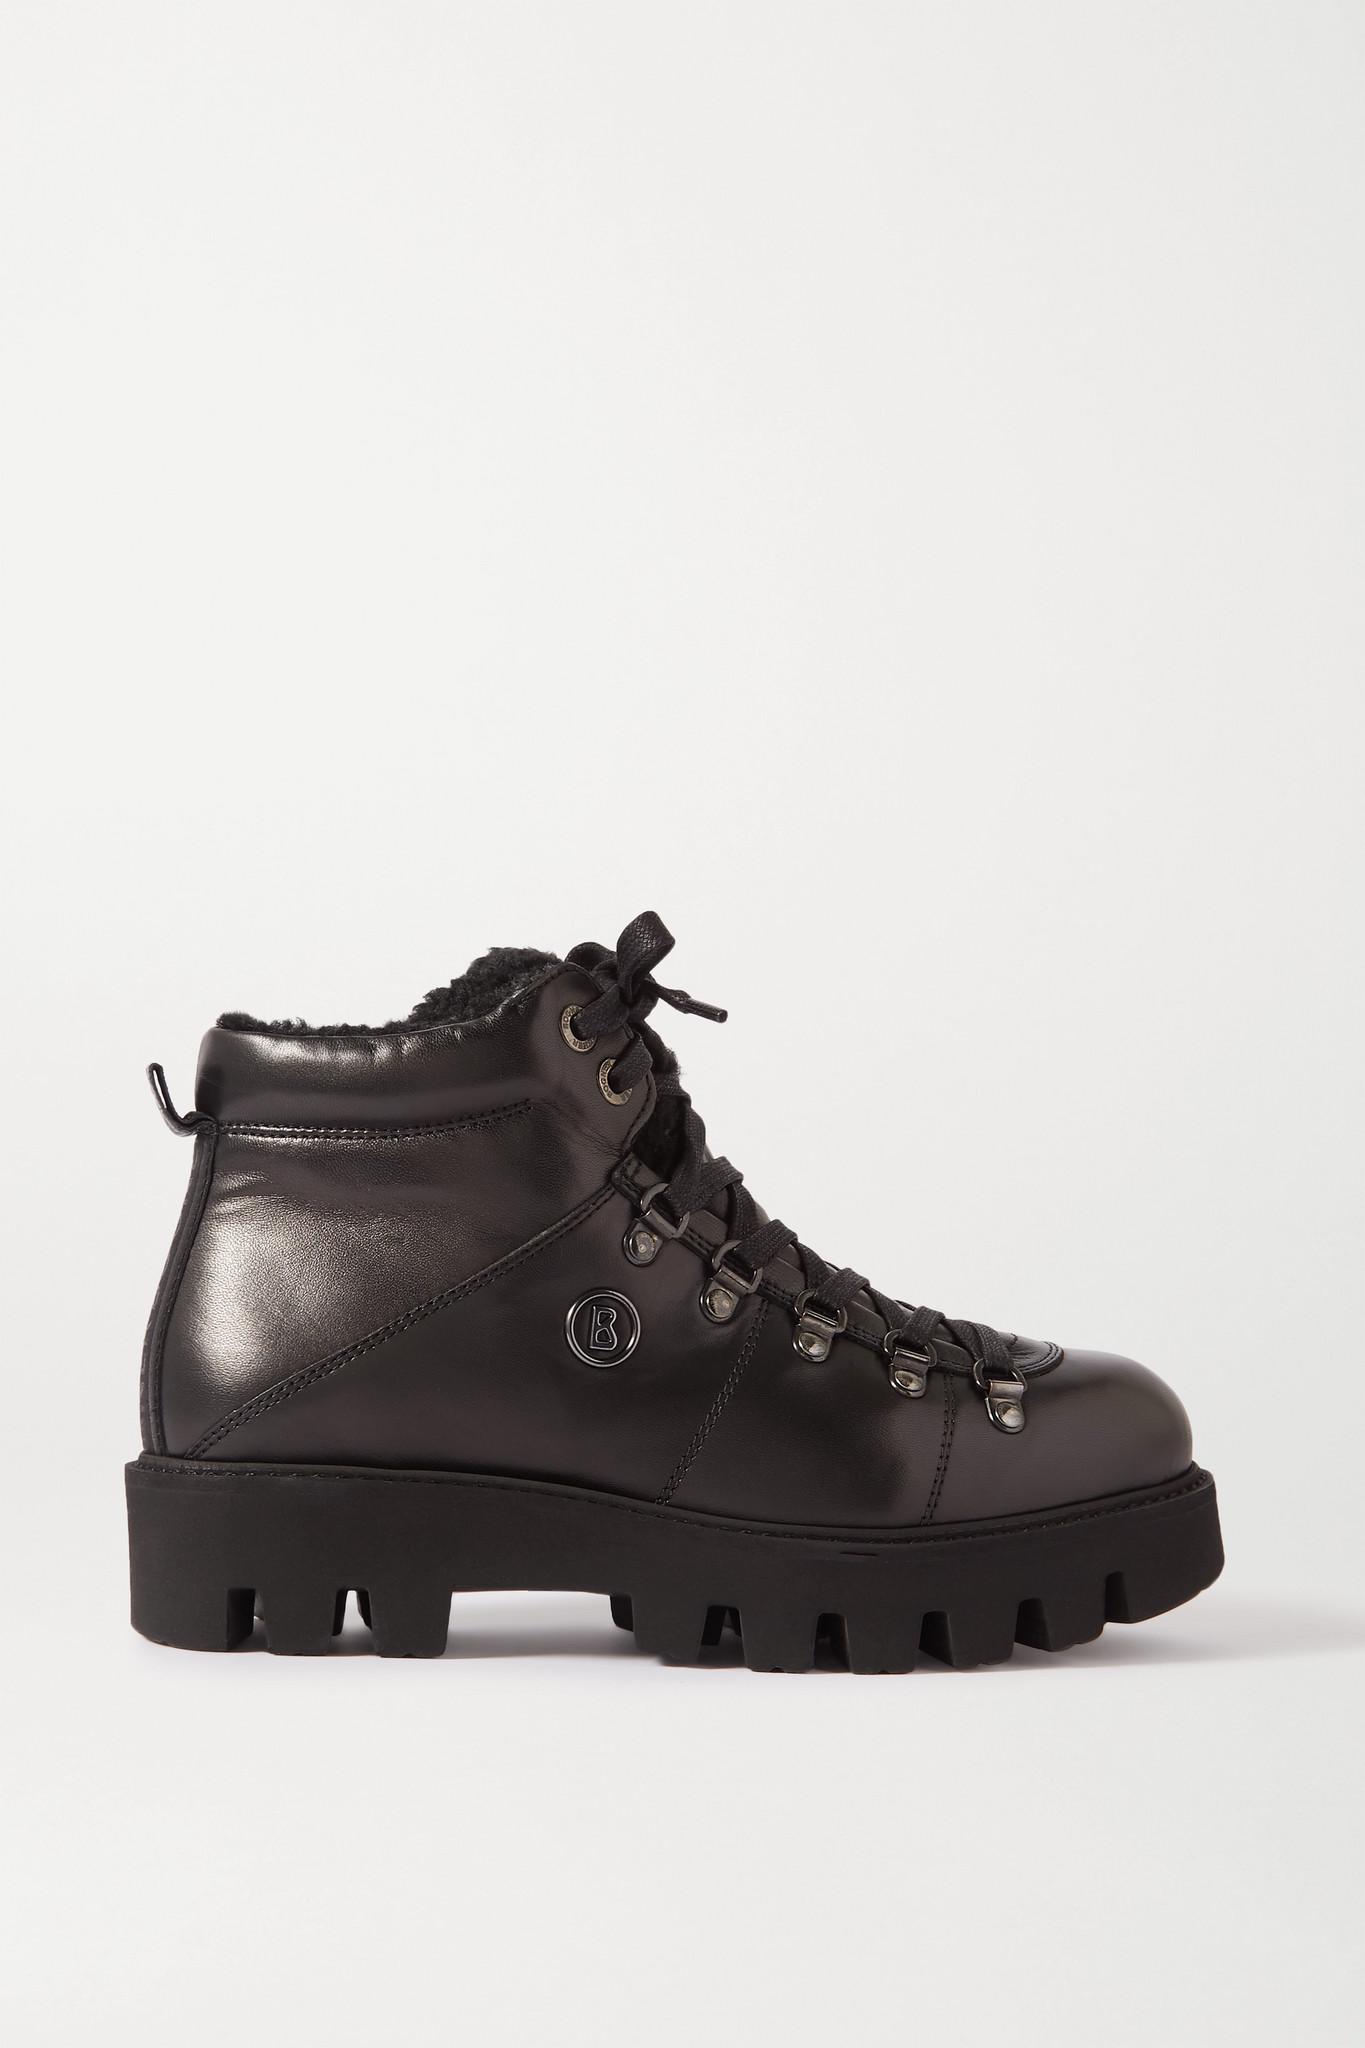 BOGNER - Copenhagen 羊毛皮衬里皮革踝靴 - 黑色 - IT40